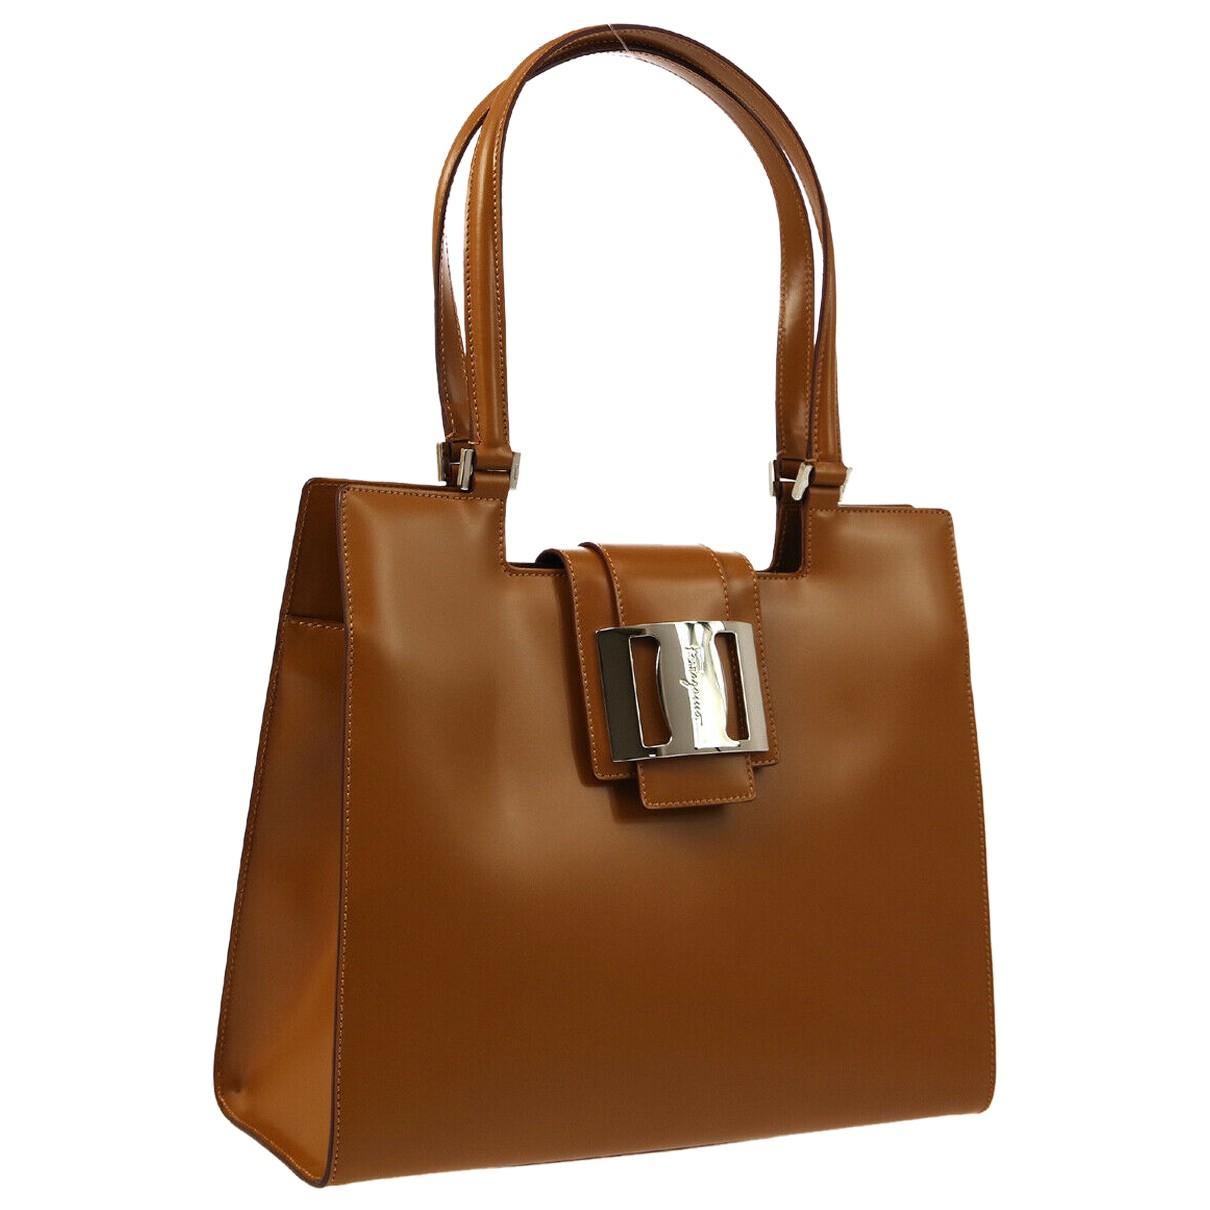 Salvatore Ferragamo \N Camel Leather handbag for Women \N